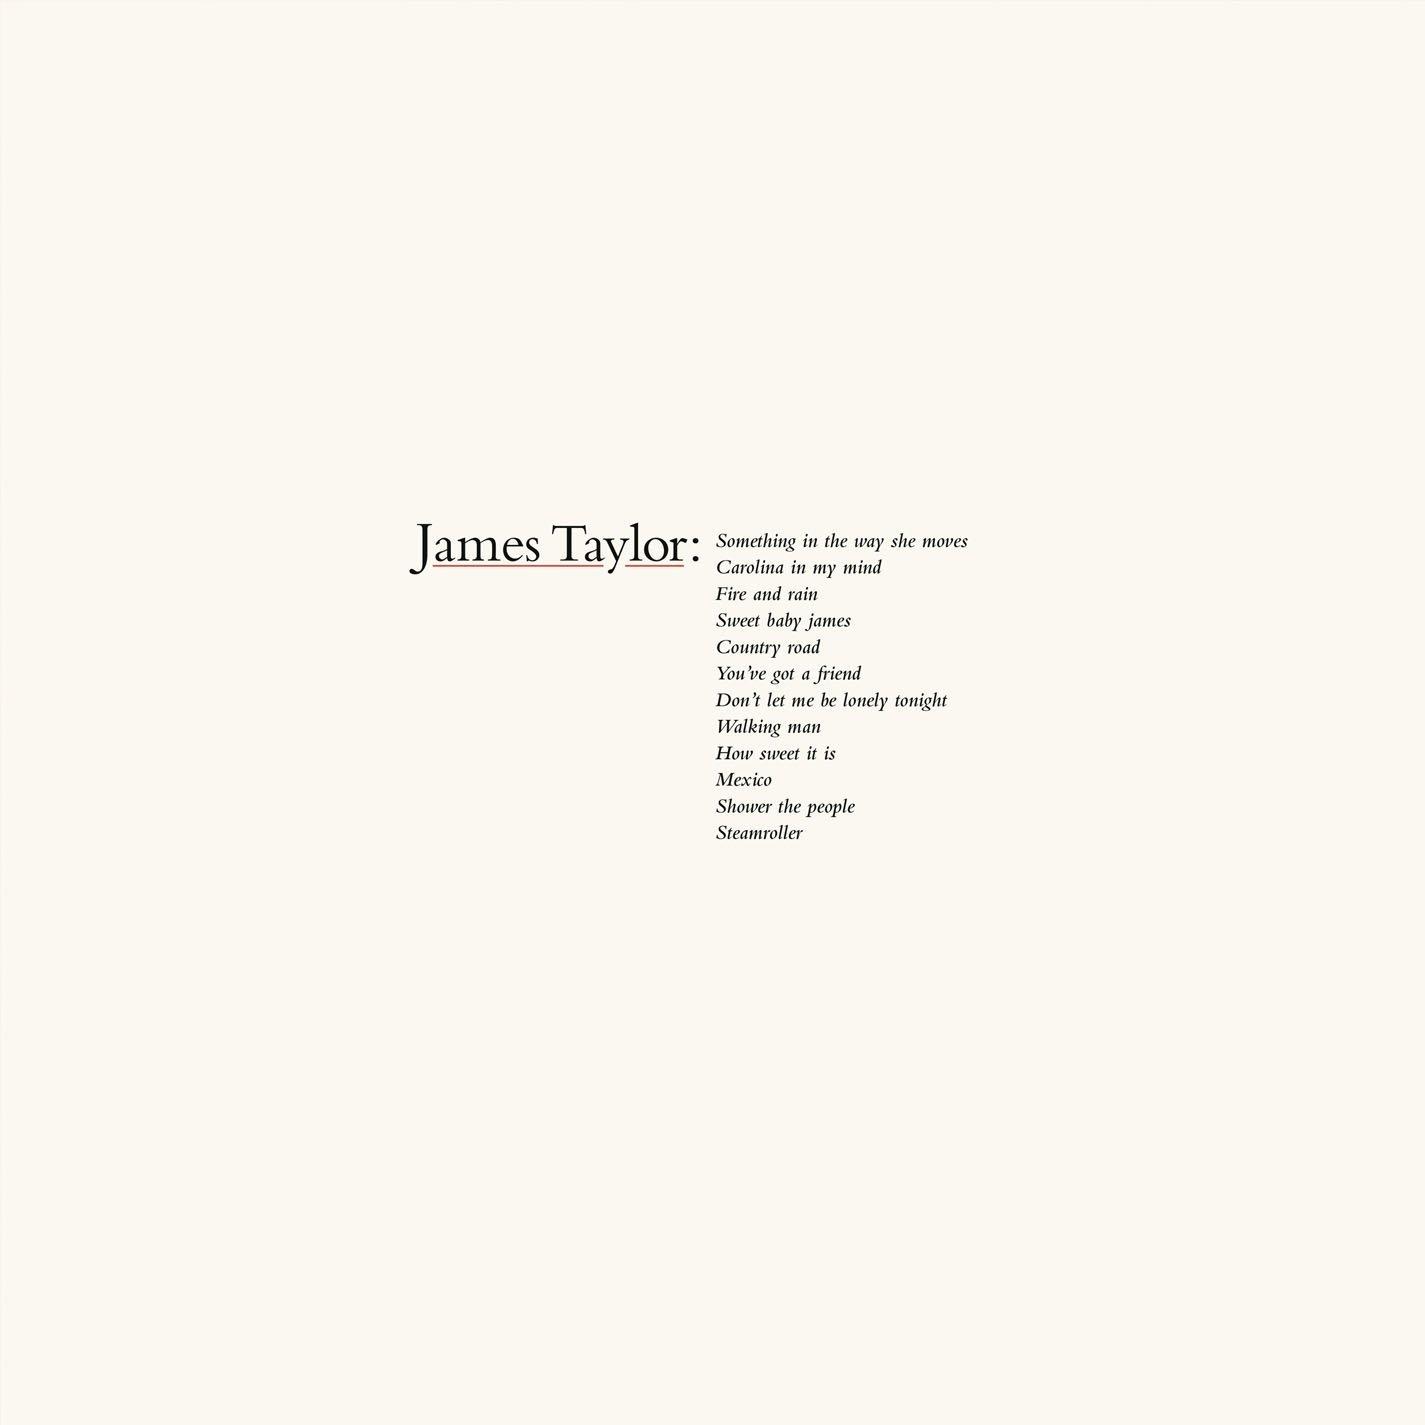 Greatest Hits Lp Vinile James Taylor Vinili Online 1976